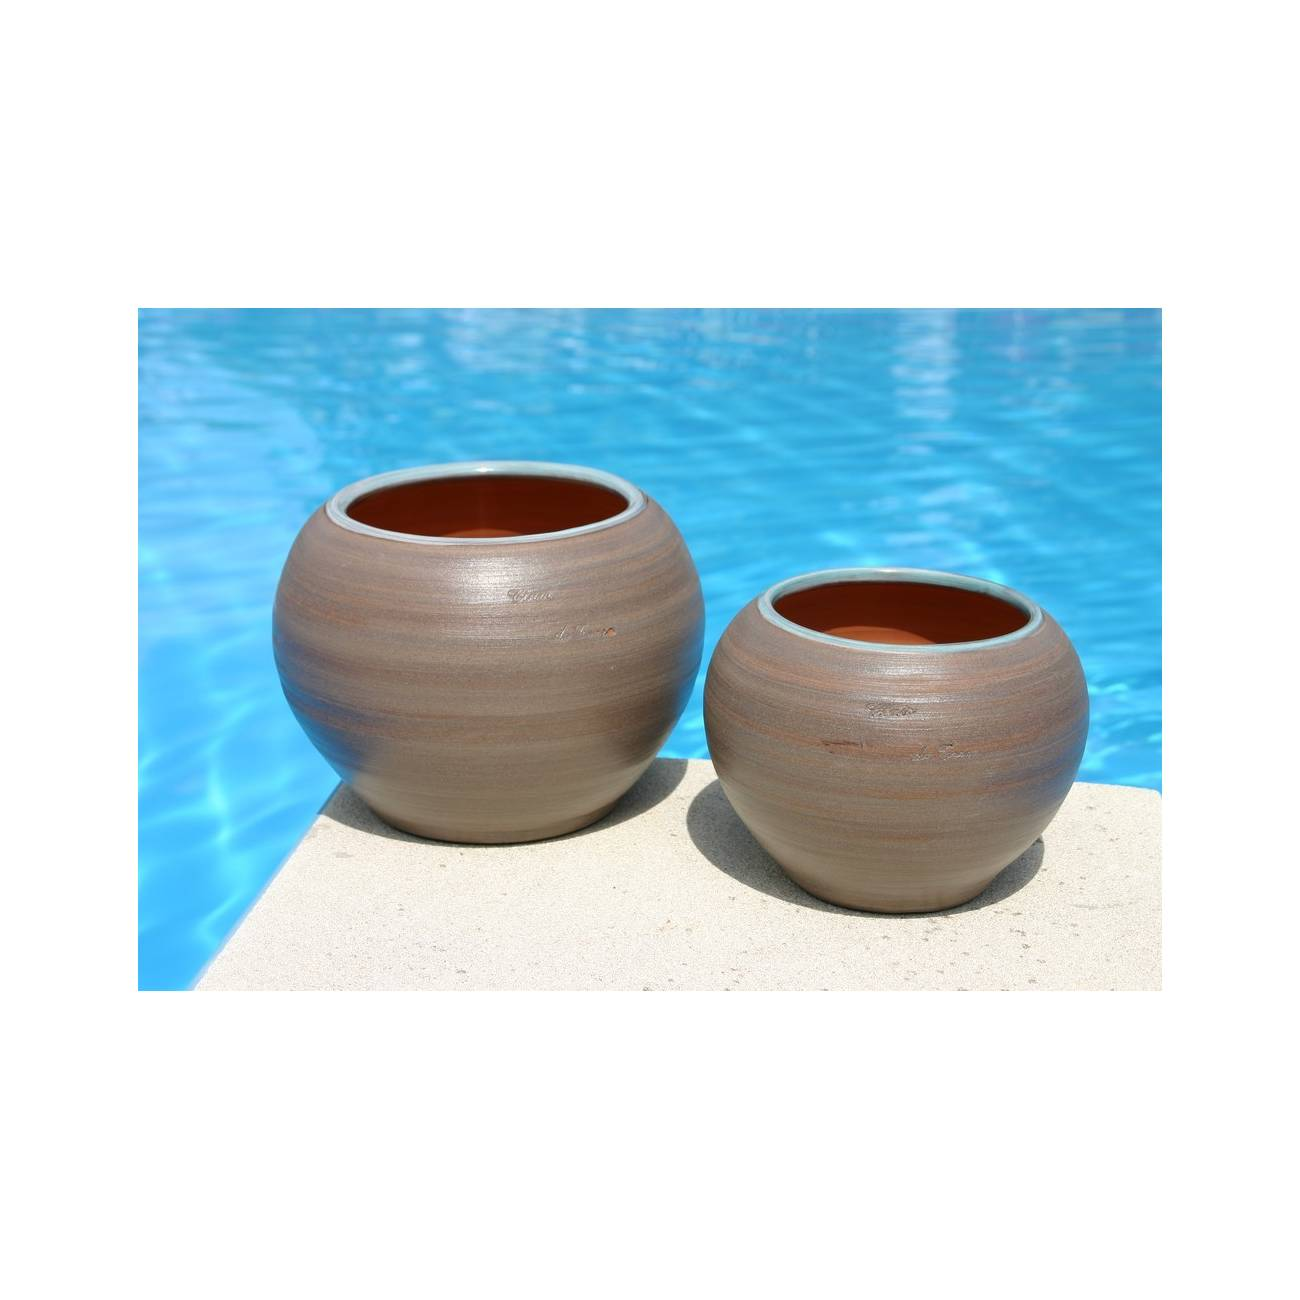 bor al galet bleu poterie bleue clair les poteries d 39 albi. Black Bedroom Furniture Sets. Home Design Ideas